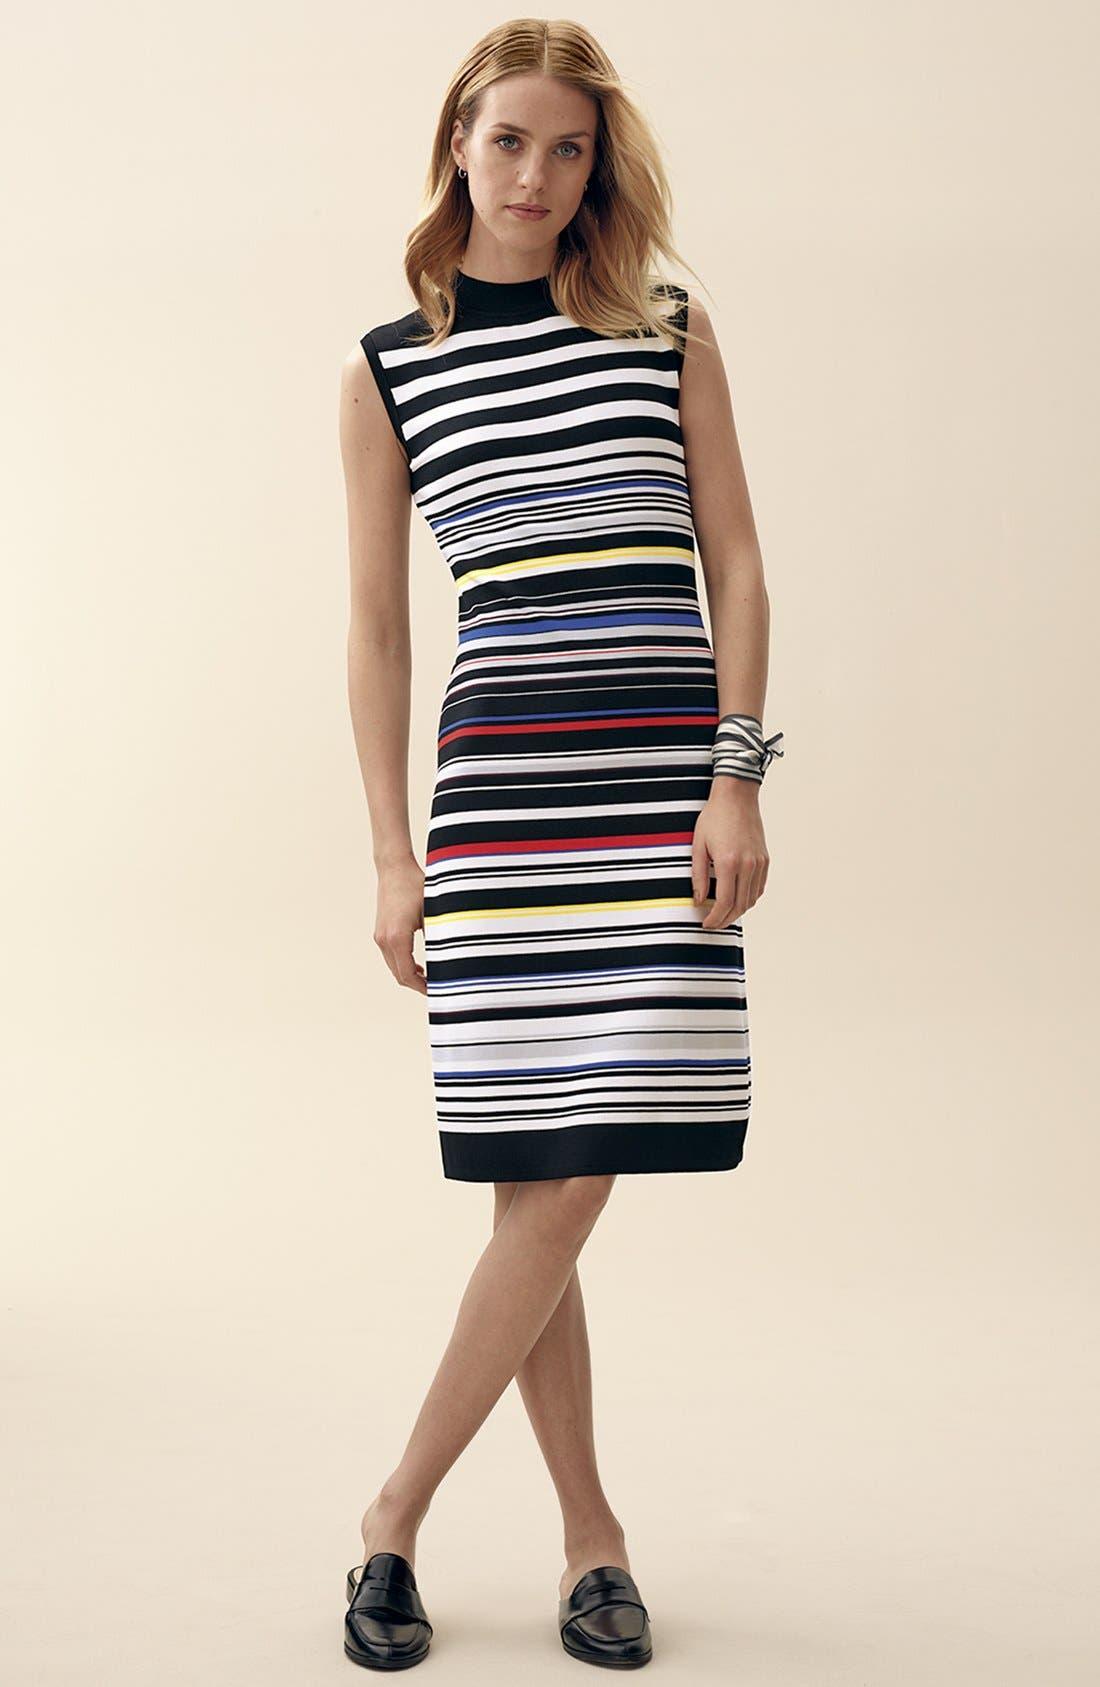 Sleeveless Mock Neck Knit Dress,                             Alternate thumbnail 2, color,                             Black- Red Stripe